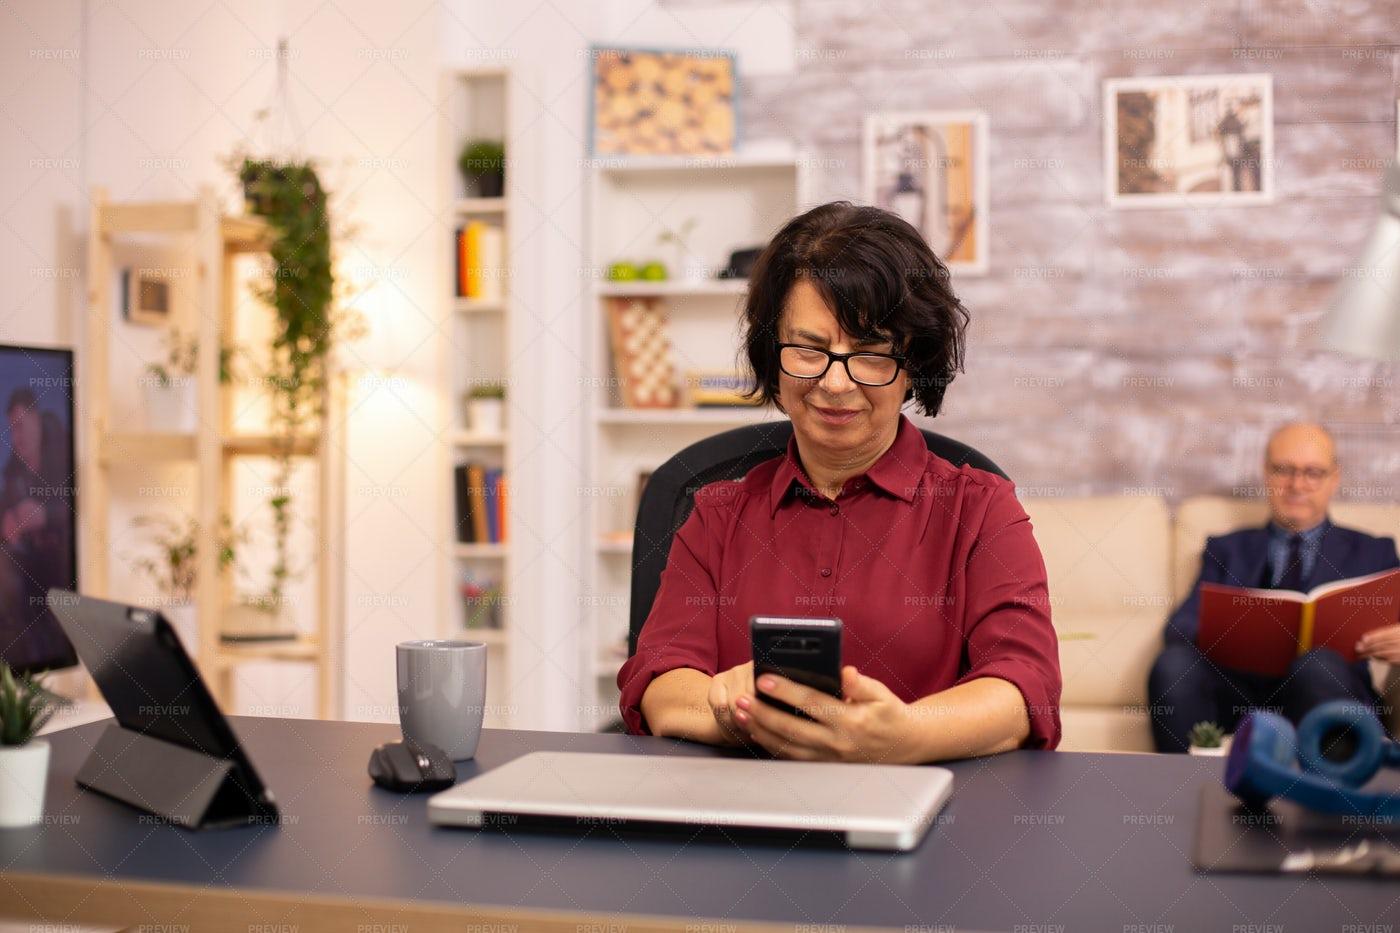 Aged Woman Browsing Phone: Stock Photos